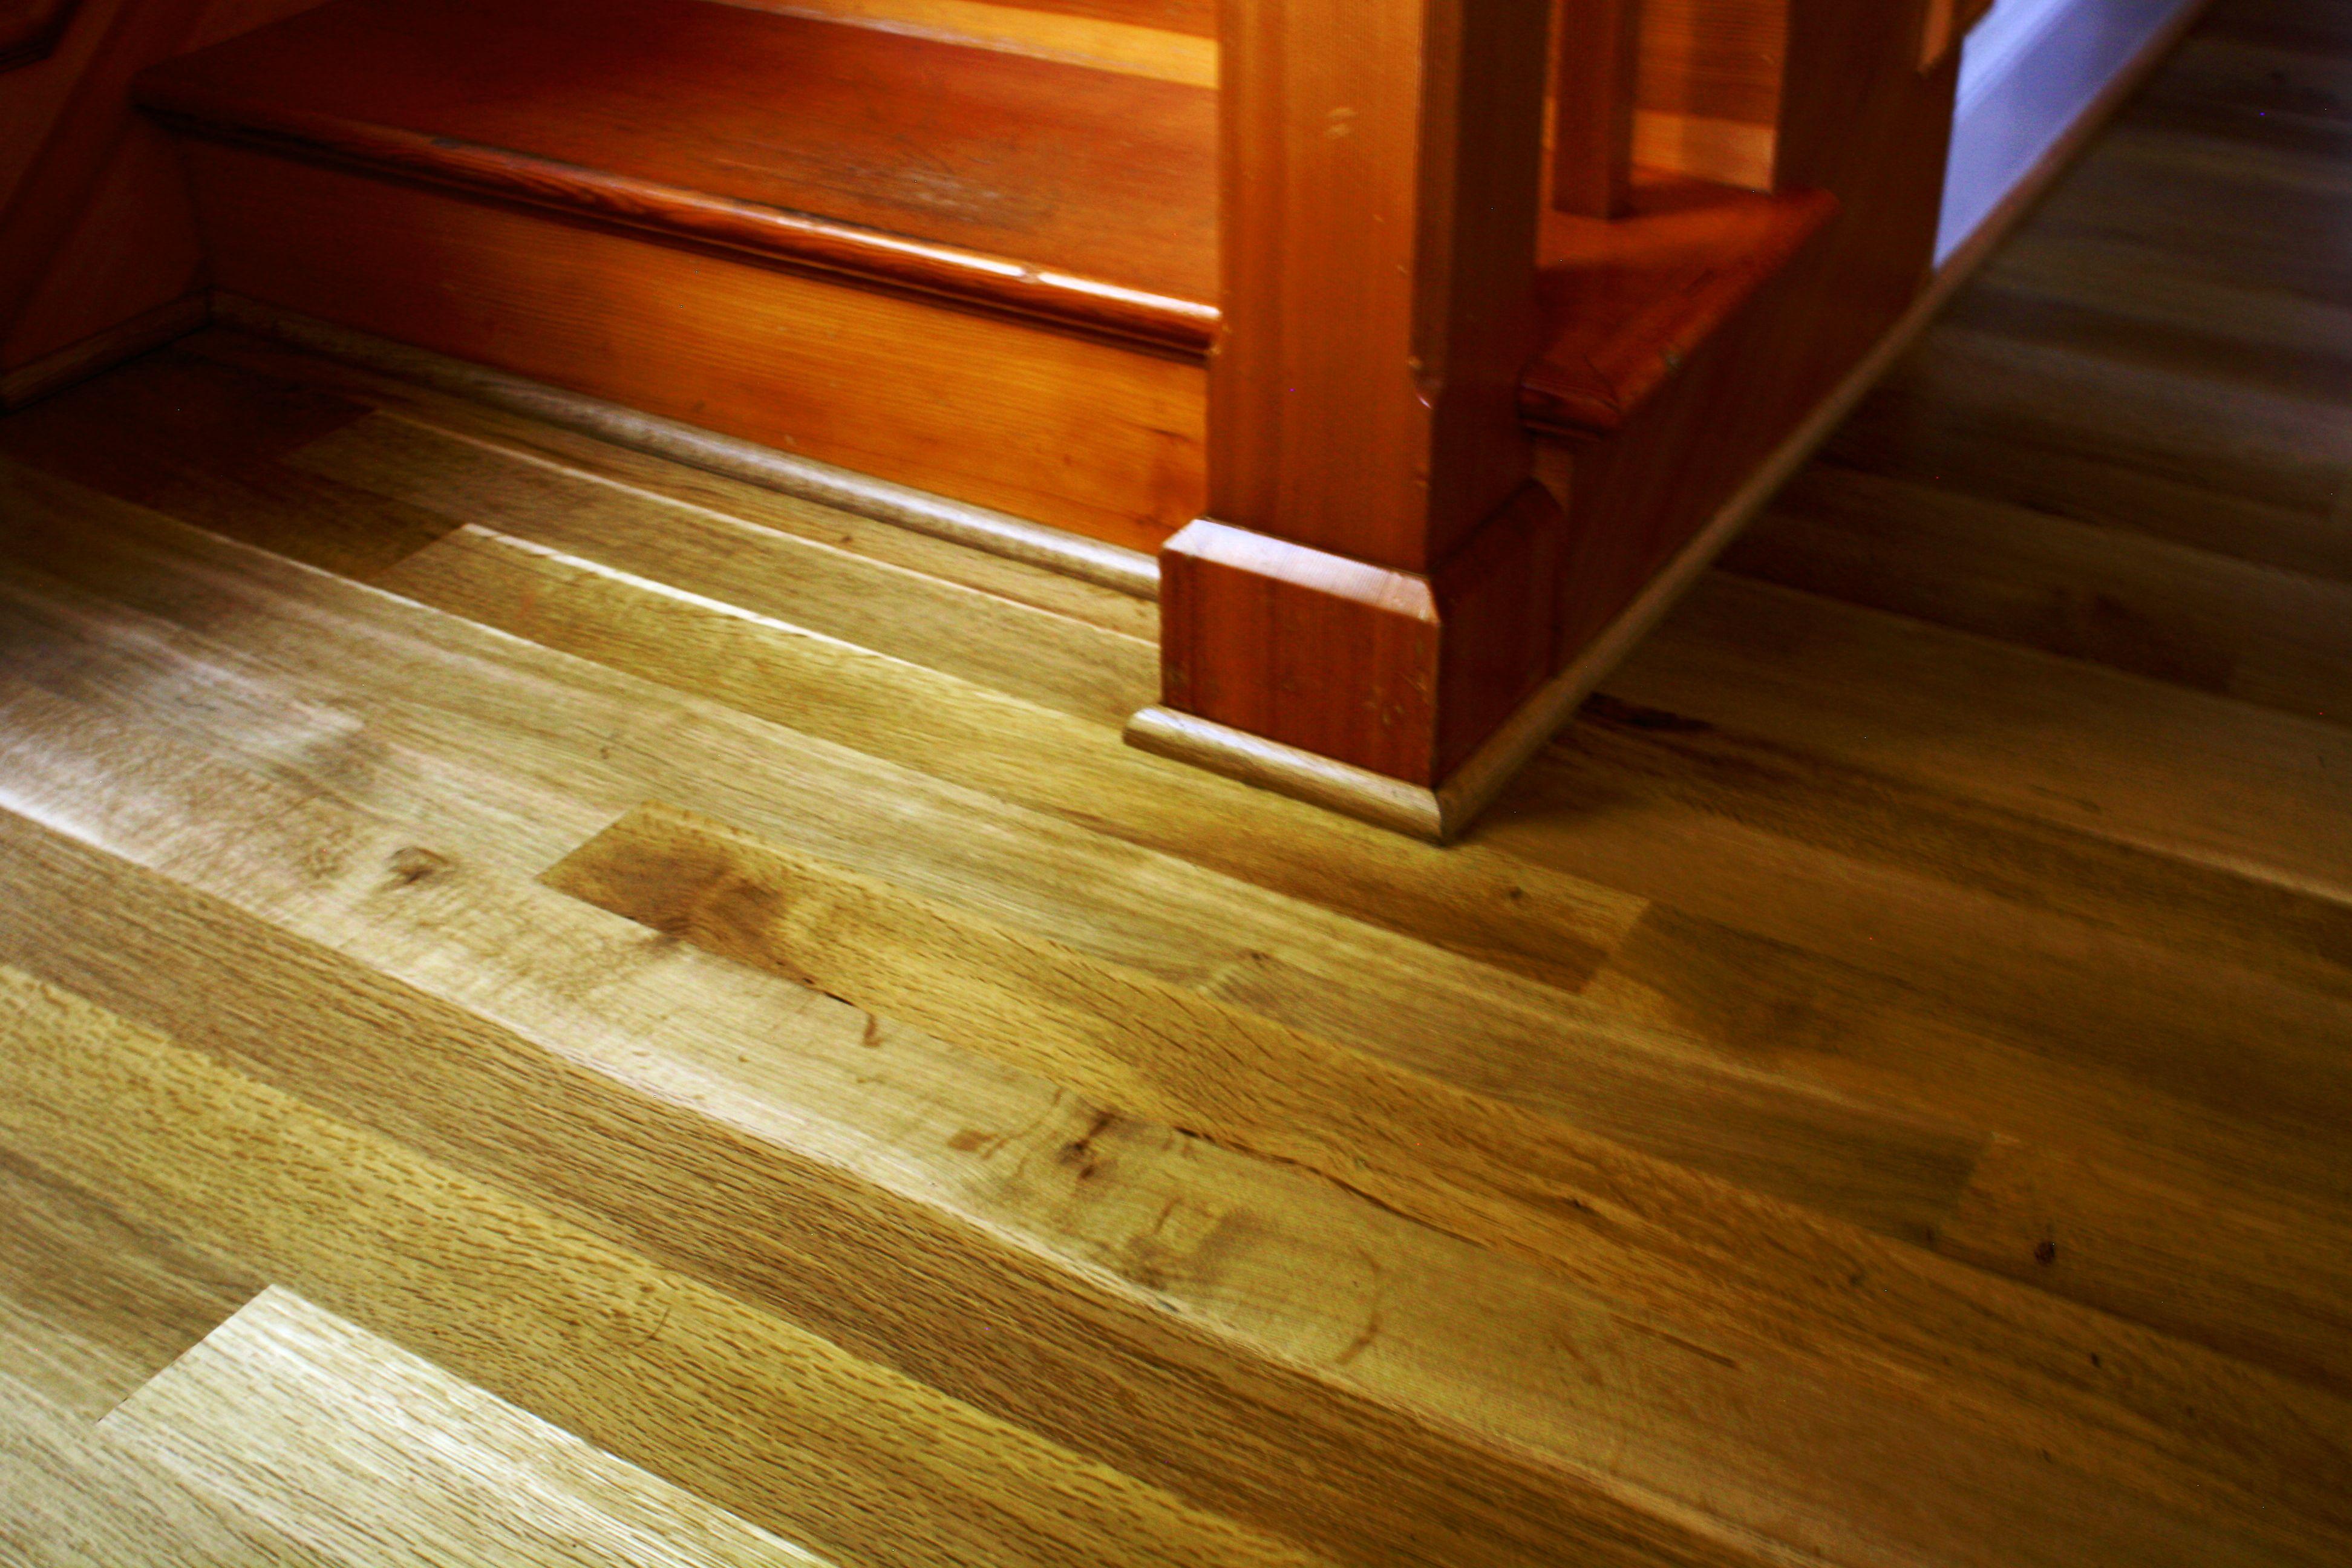 Oregon White Oak hardwood floors and Douglas Fir stairs